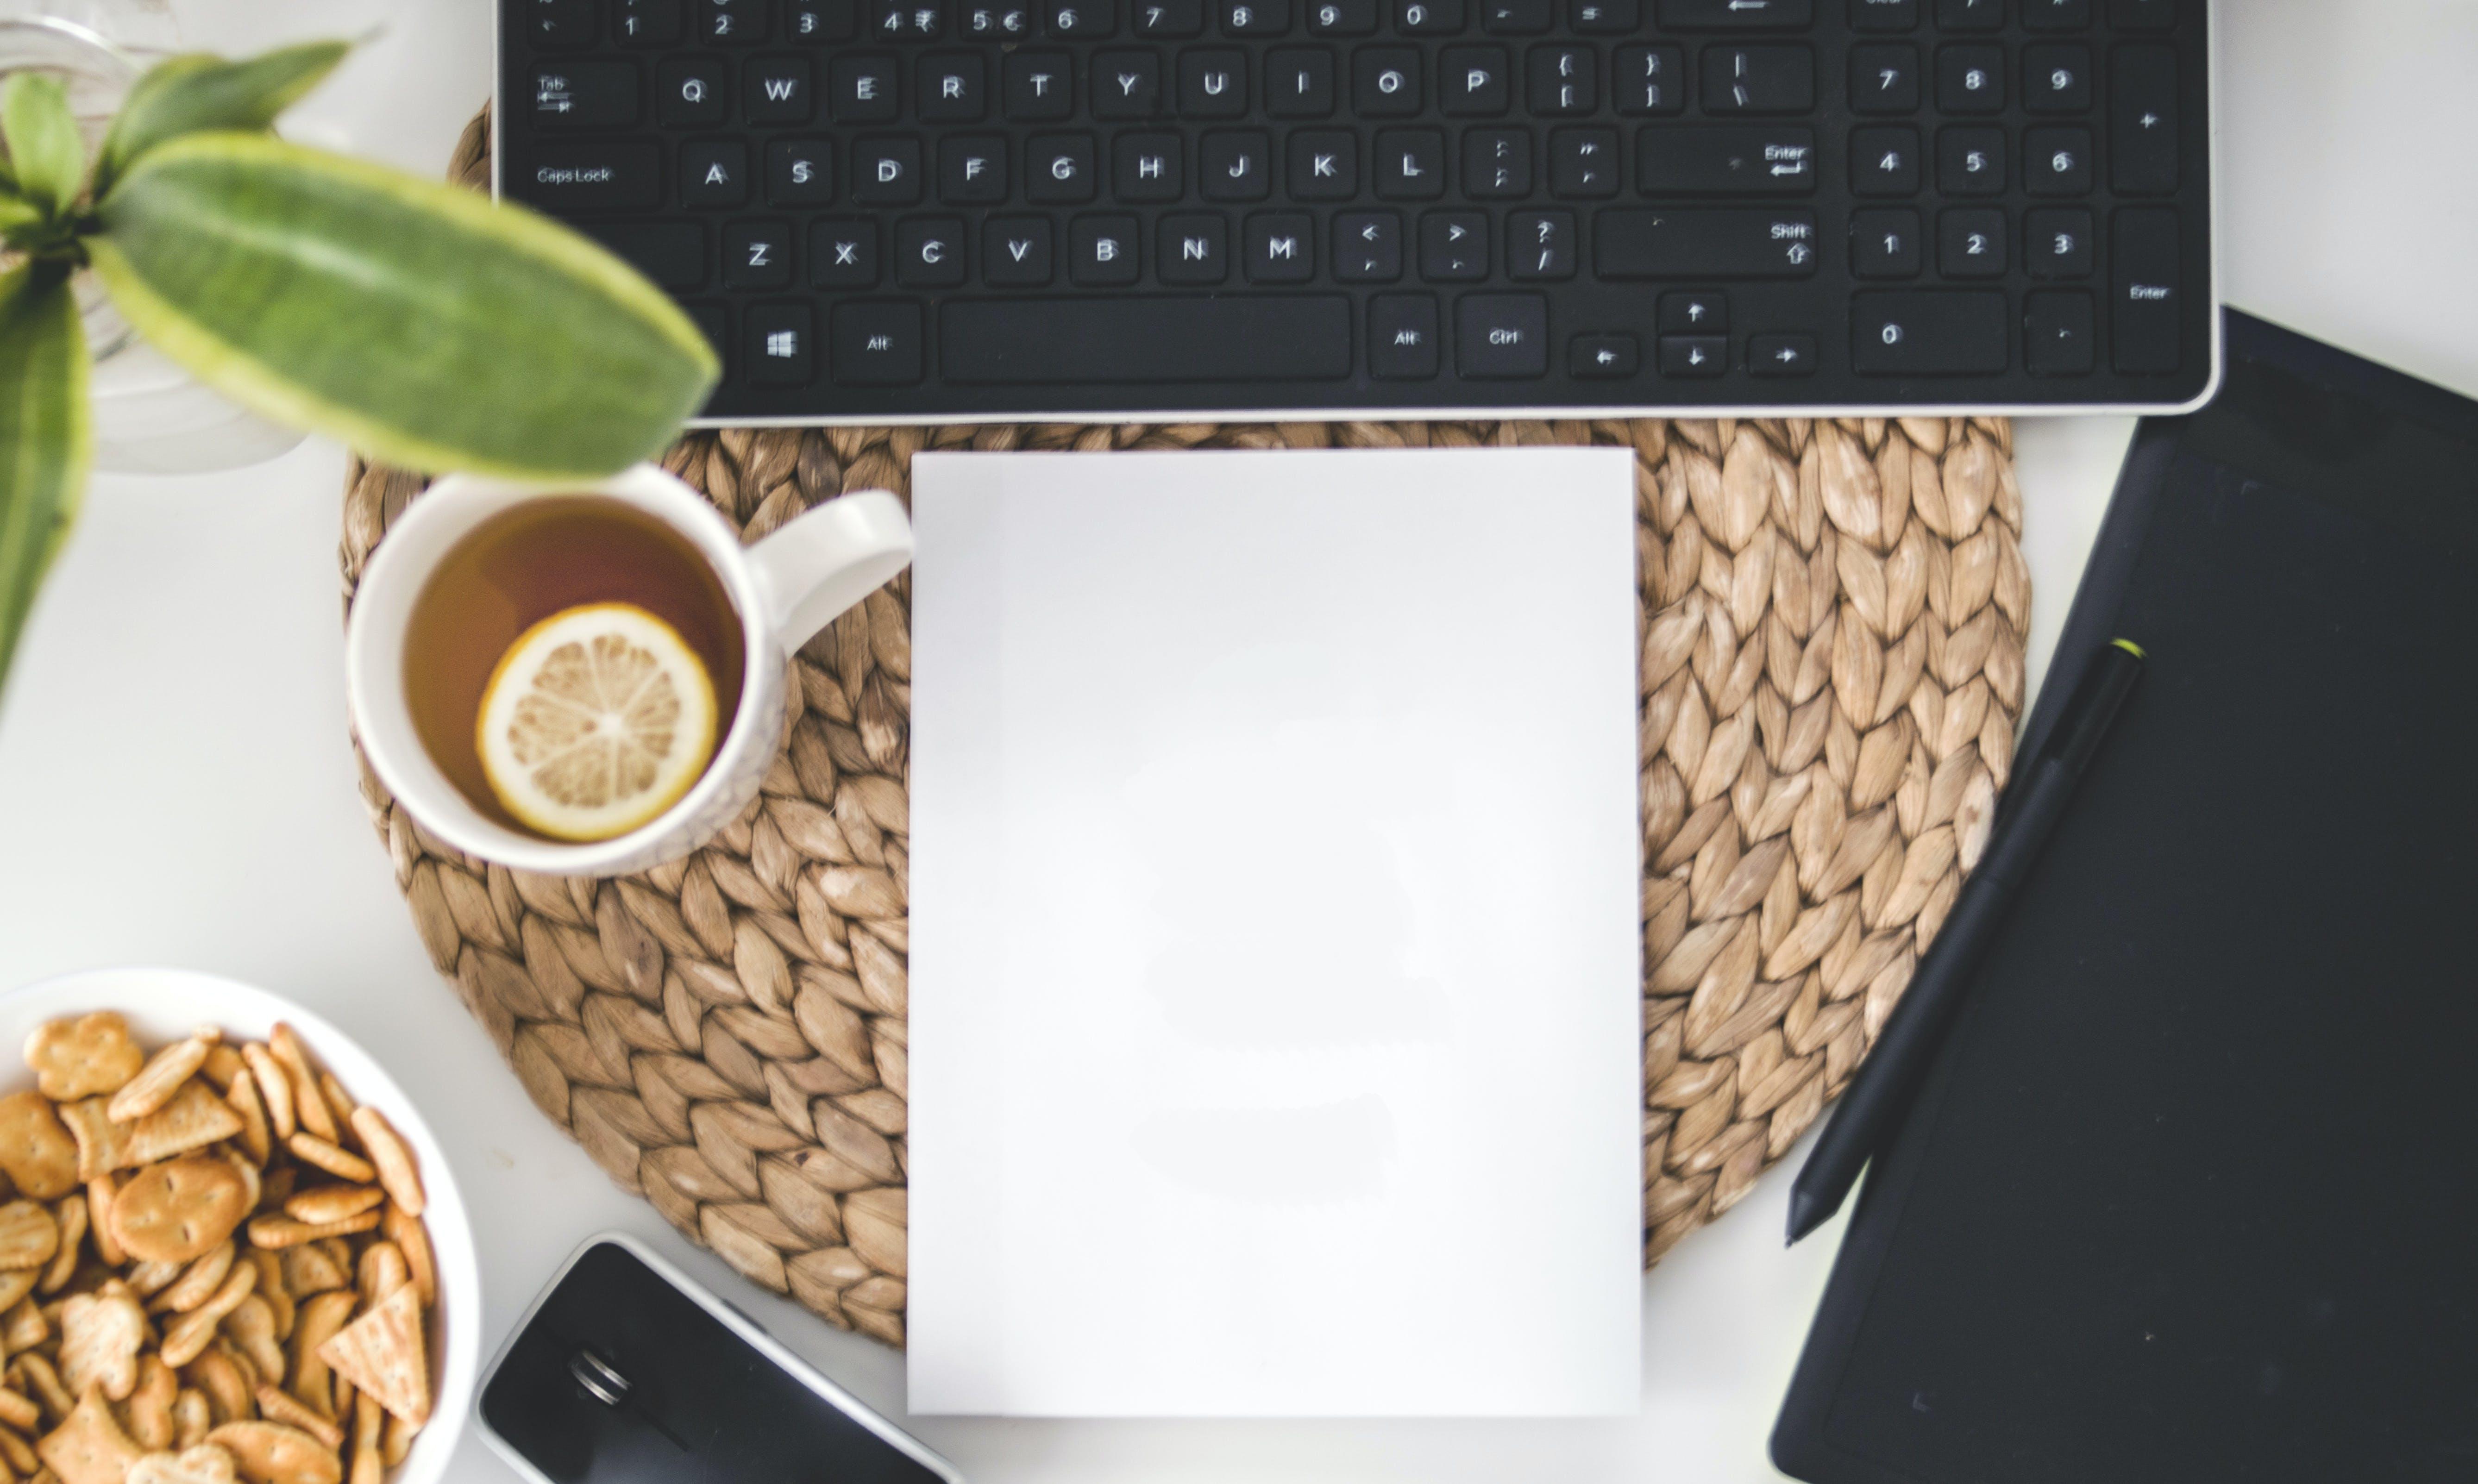 White Printing Paper Near Black Computer Keyboard